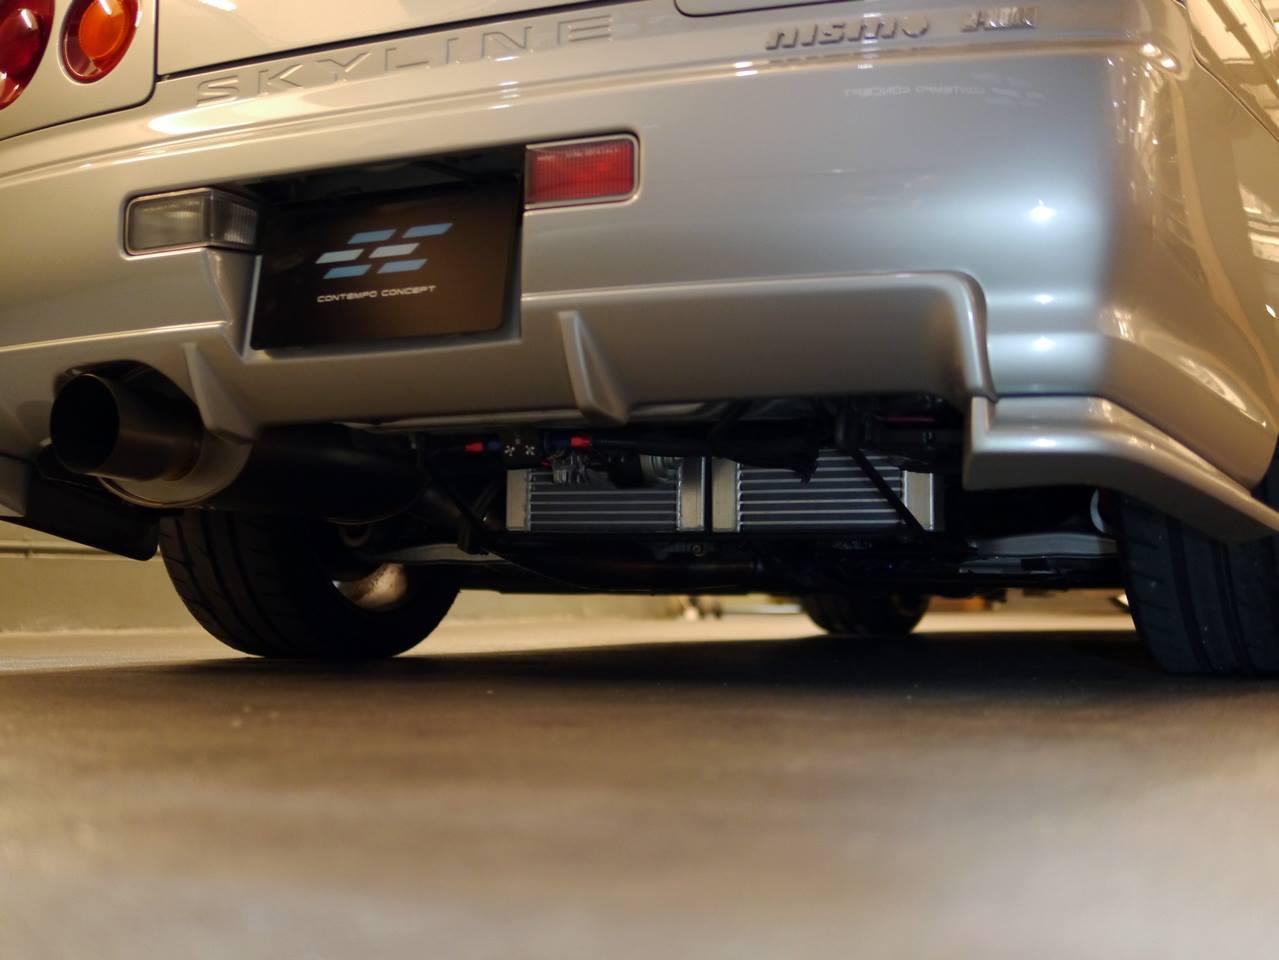 Nismo Nissan GT-R R34 Z -Tune for sale (6)